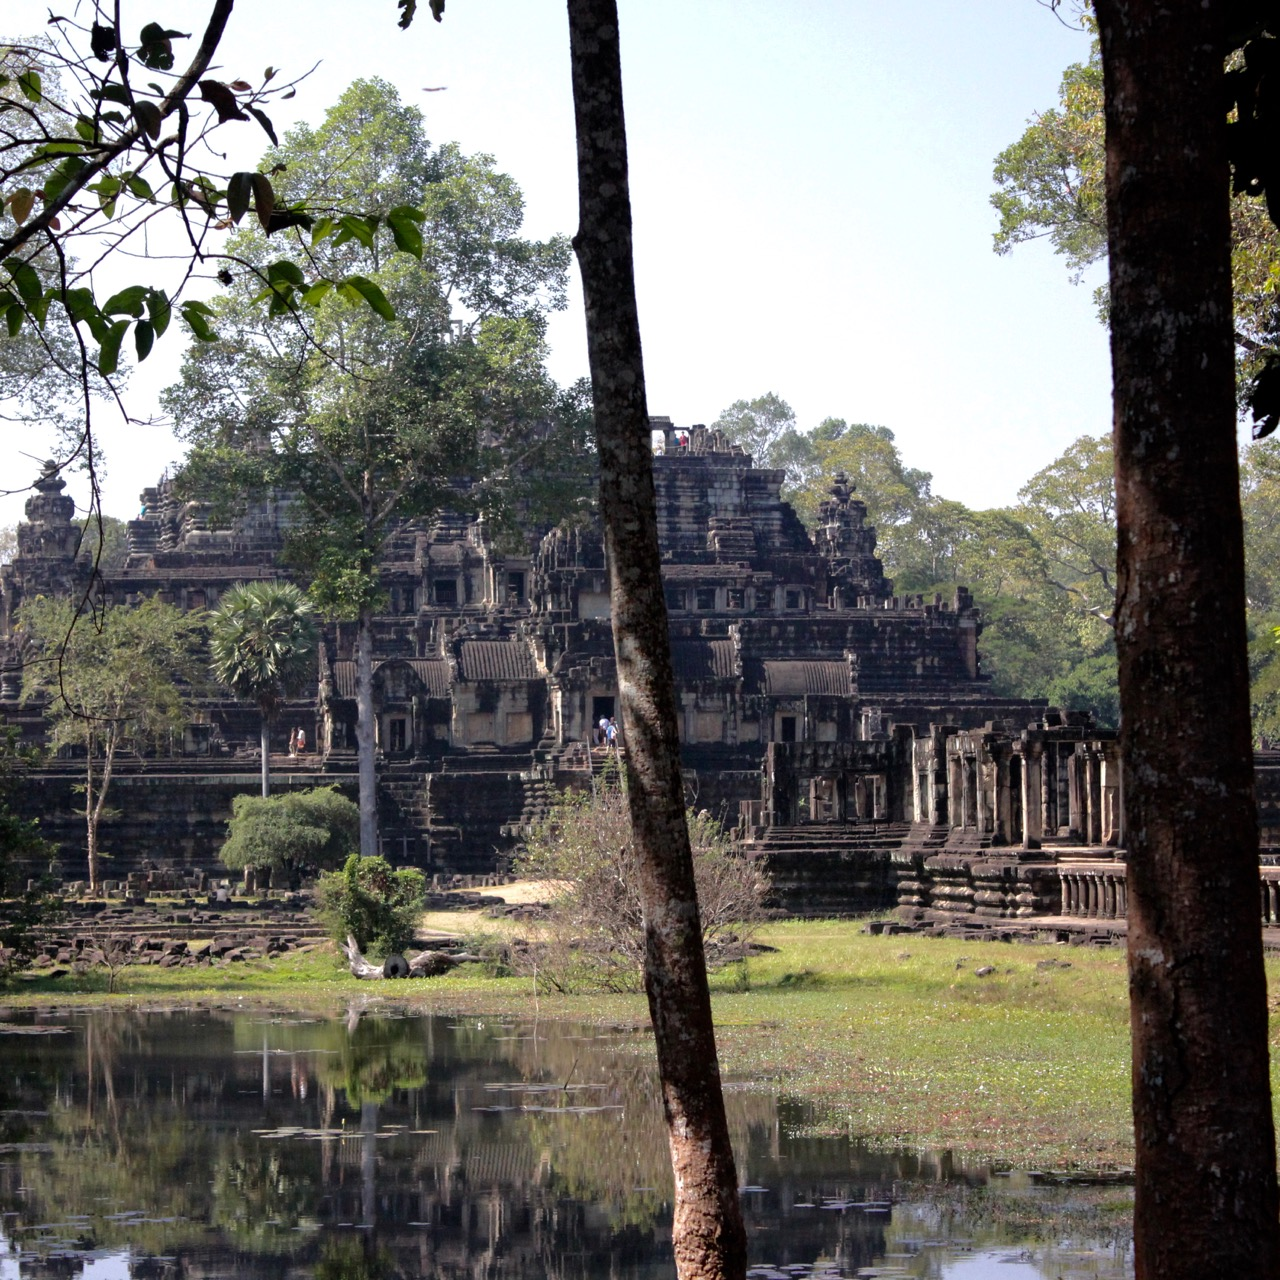 Angkor Wat, Siem Reap, Cambodia - 20